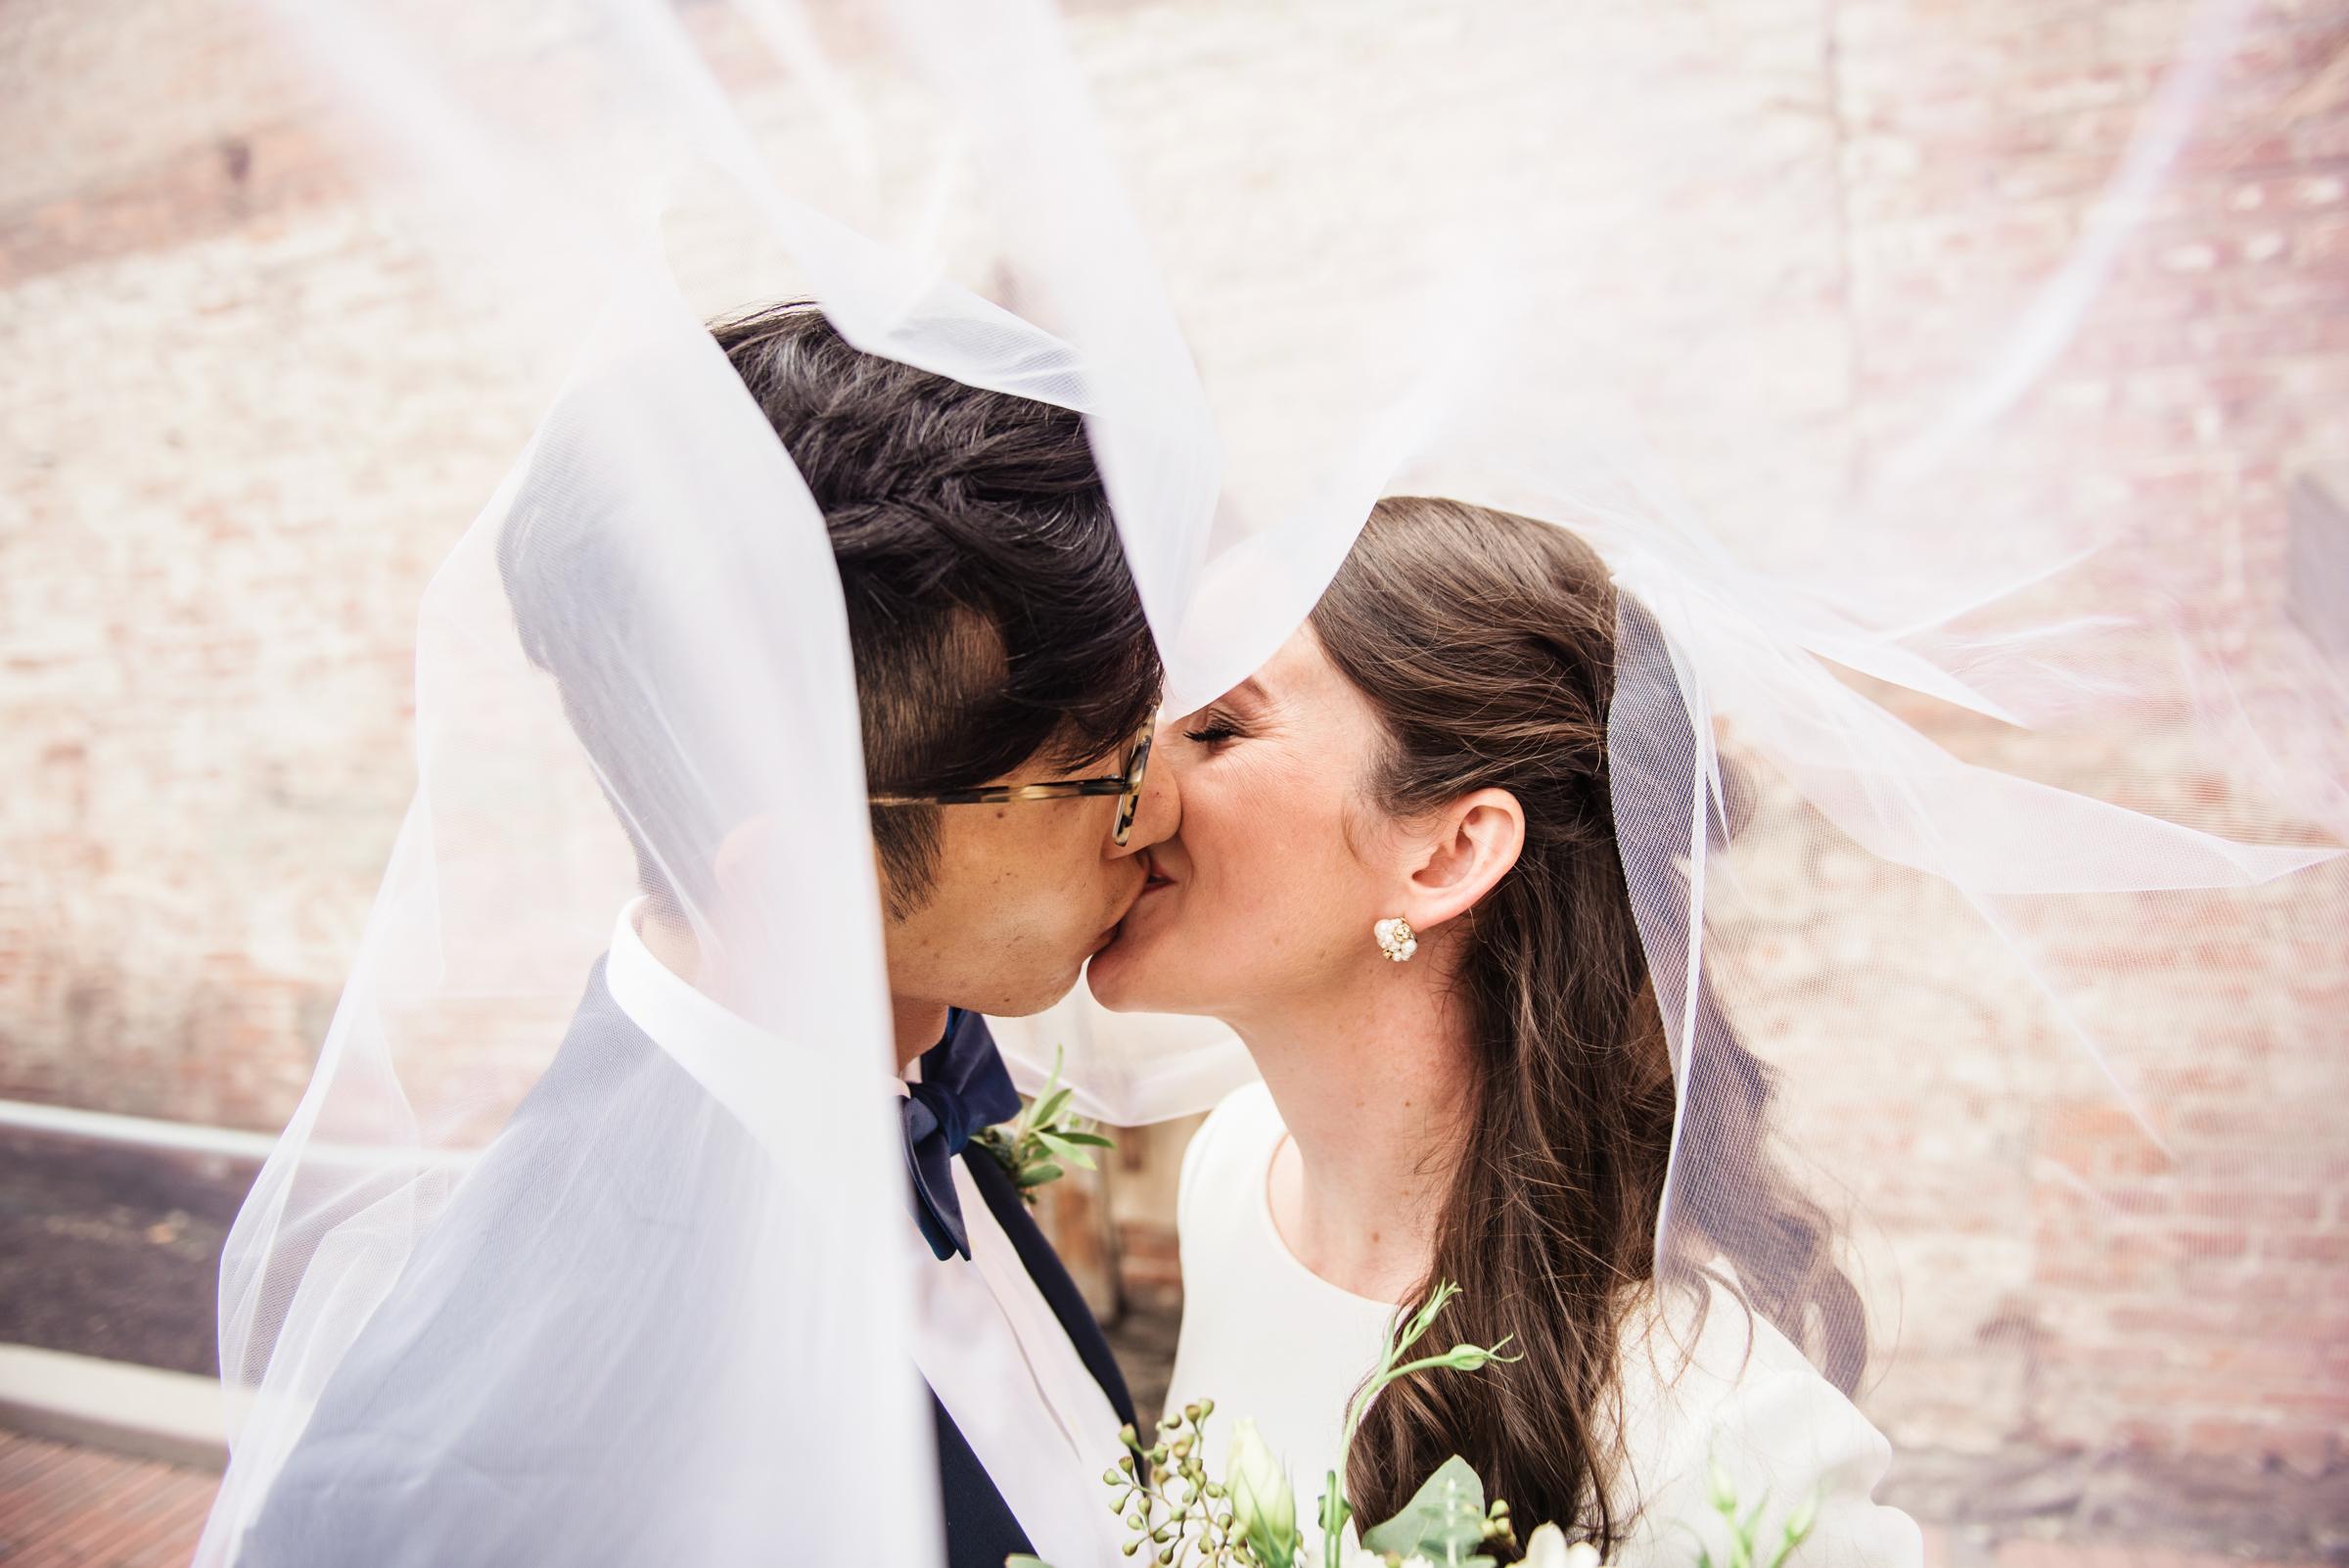 SKY_Armory_Syracuse_Wedding_JILL_STUDIO_Rochester_NY_Photographer_DSC_5970.jpg